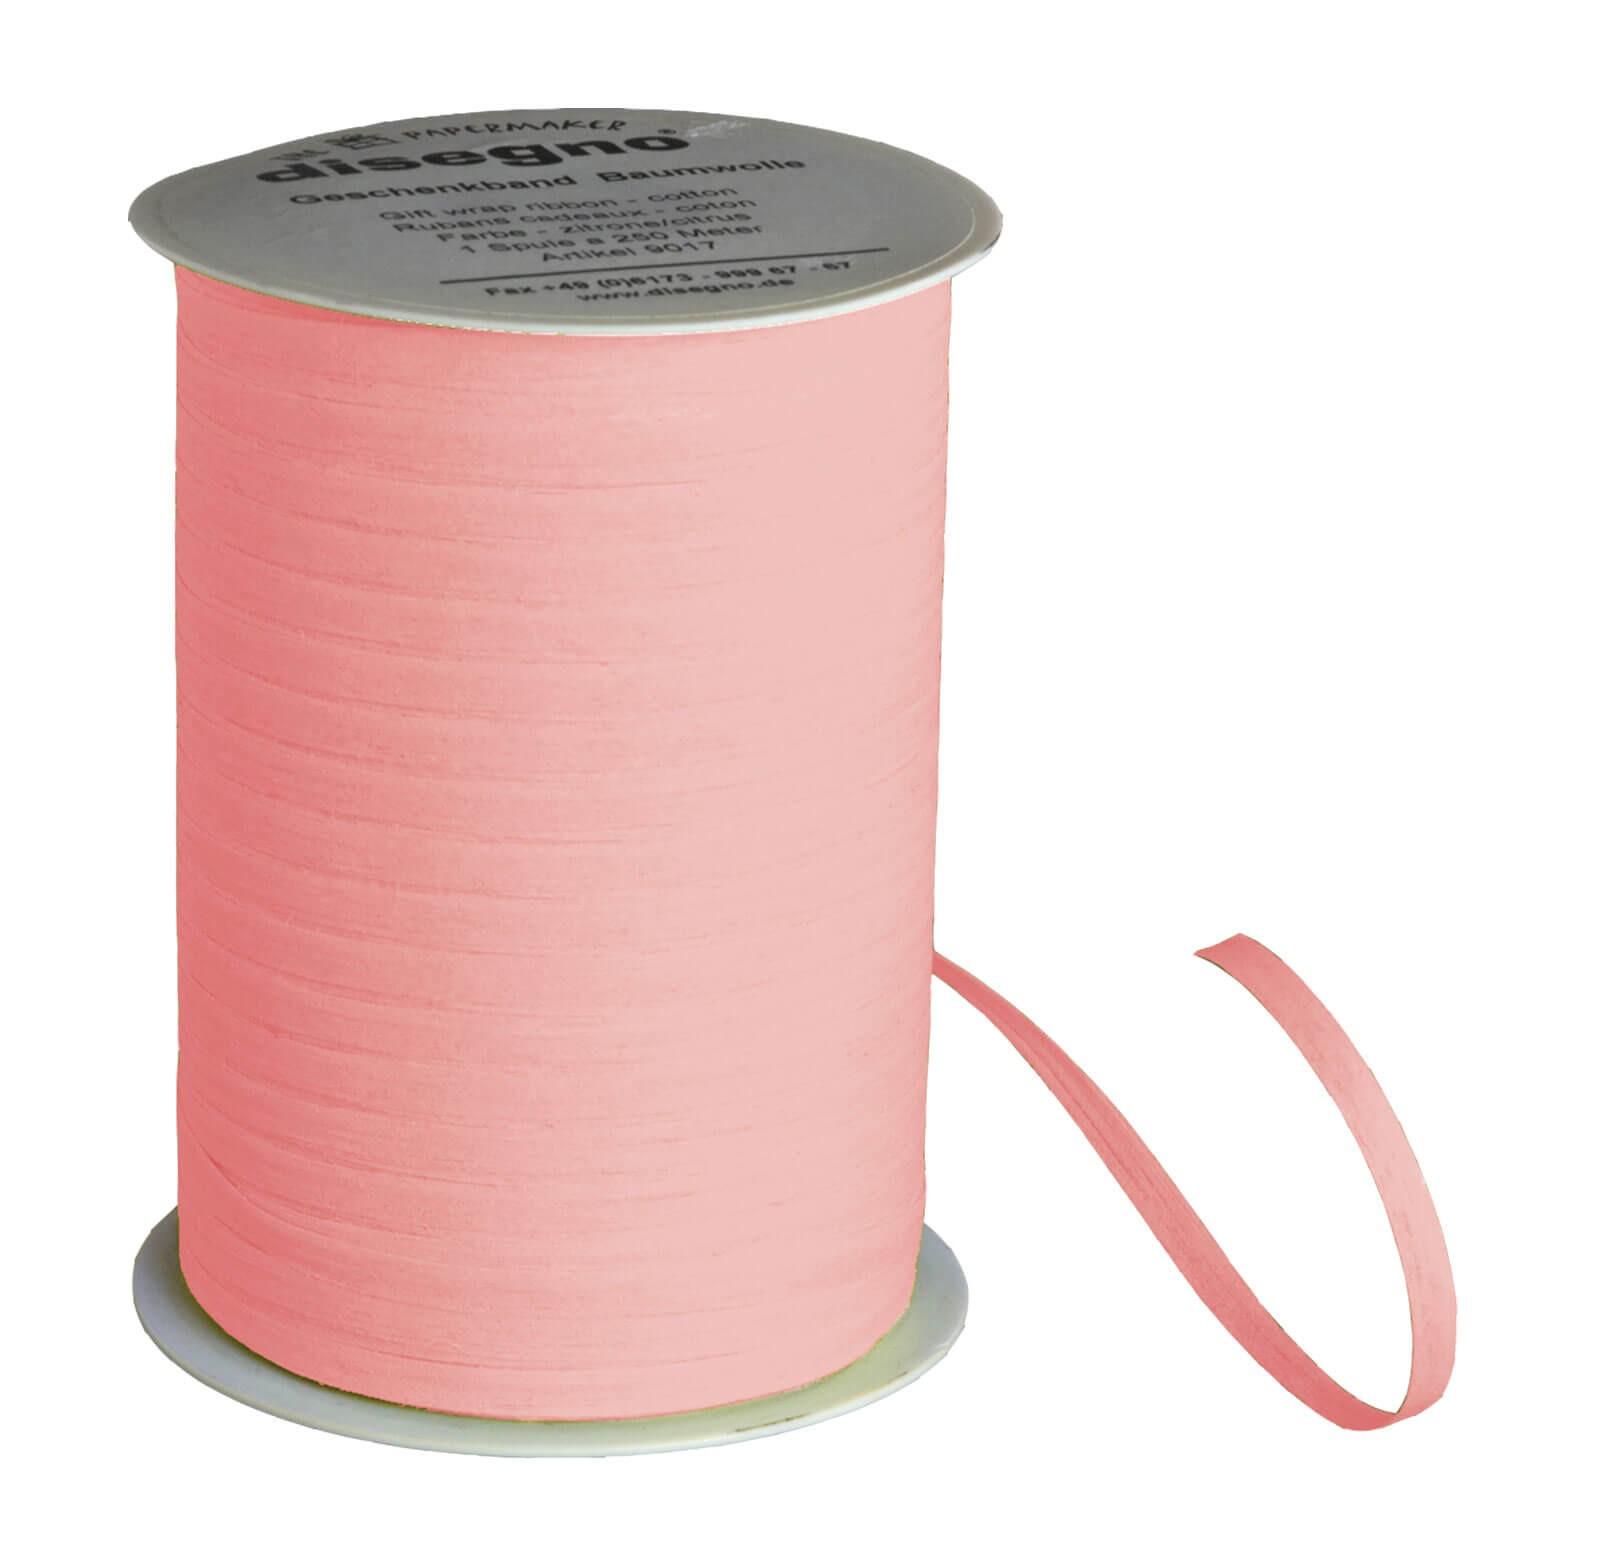 Gift ribbon cotton - light pink